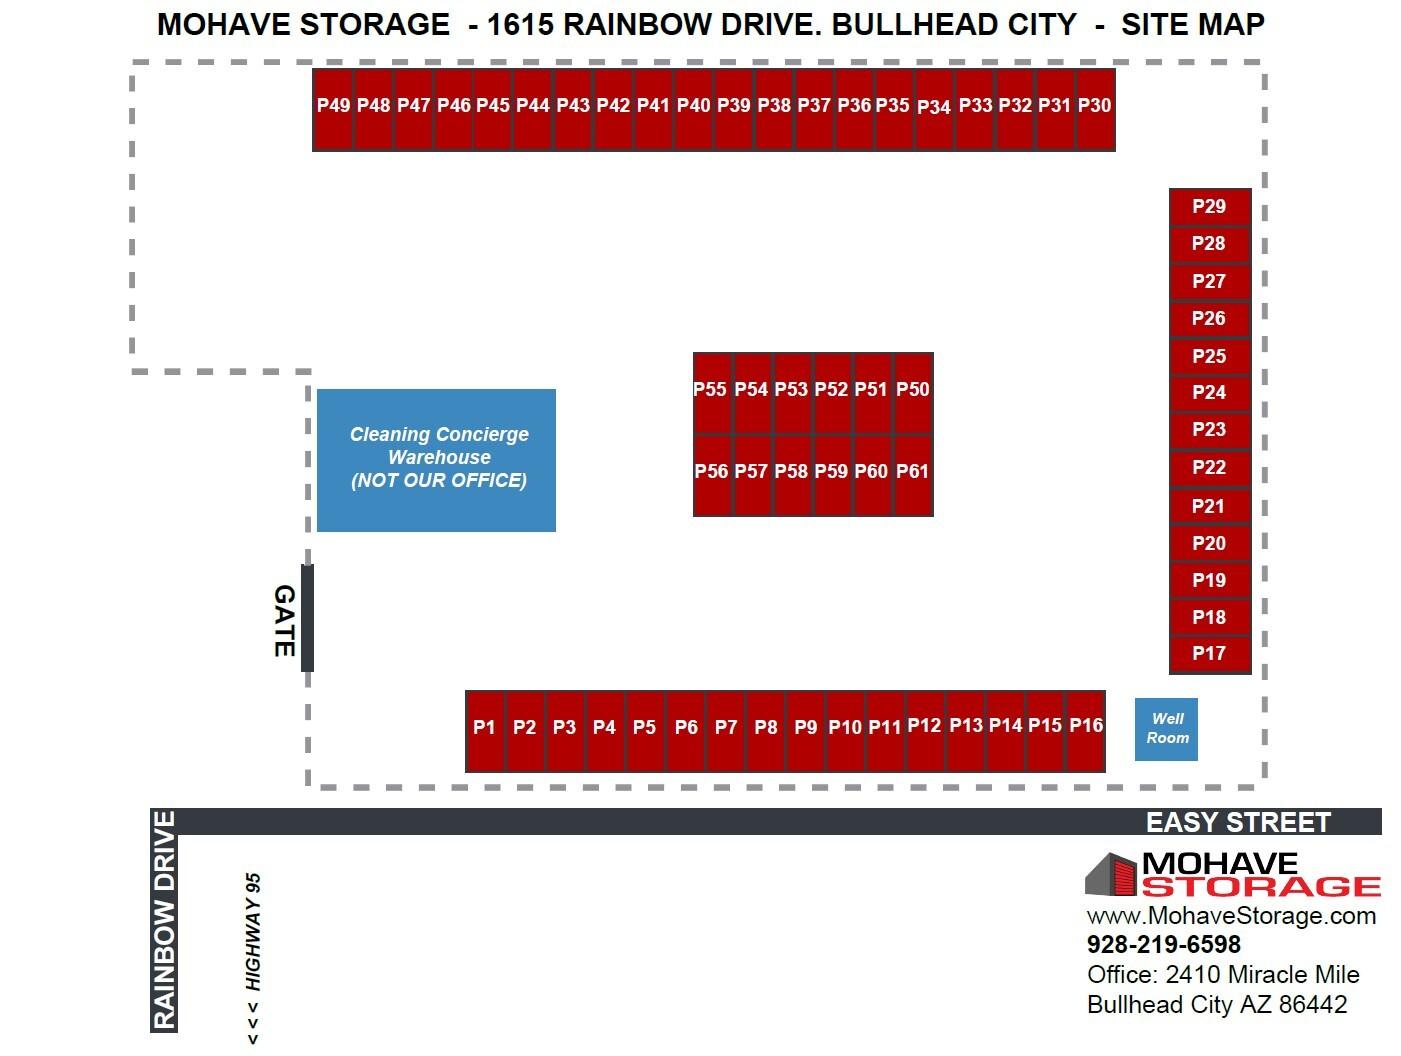 Site Map Rainbow Dr Bullhead Prospective Tenants Mohave Storage